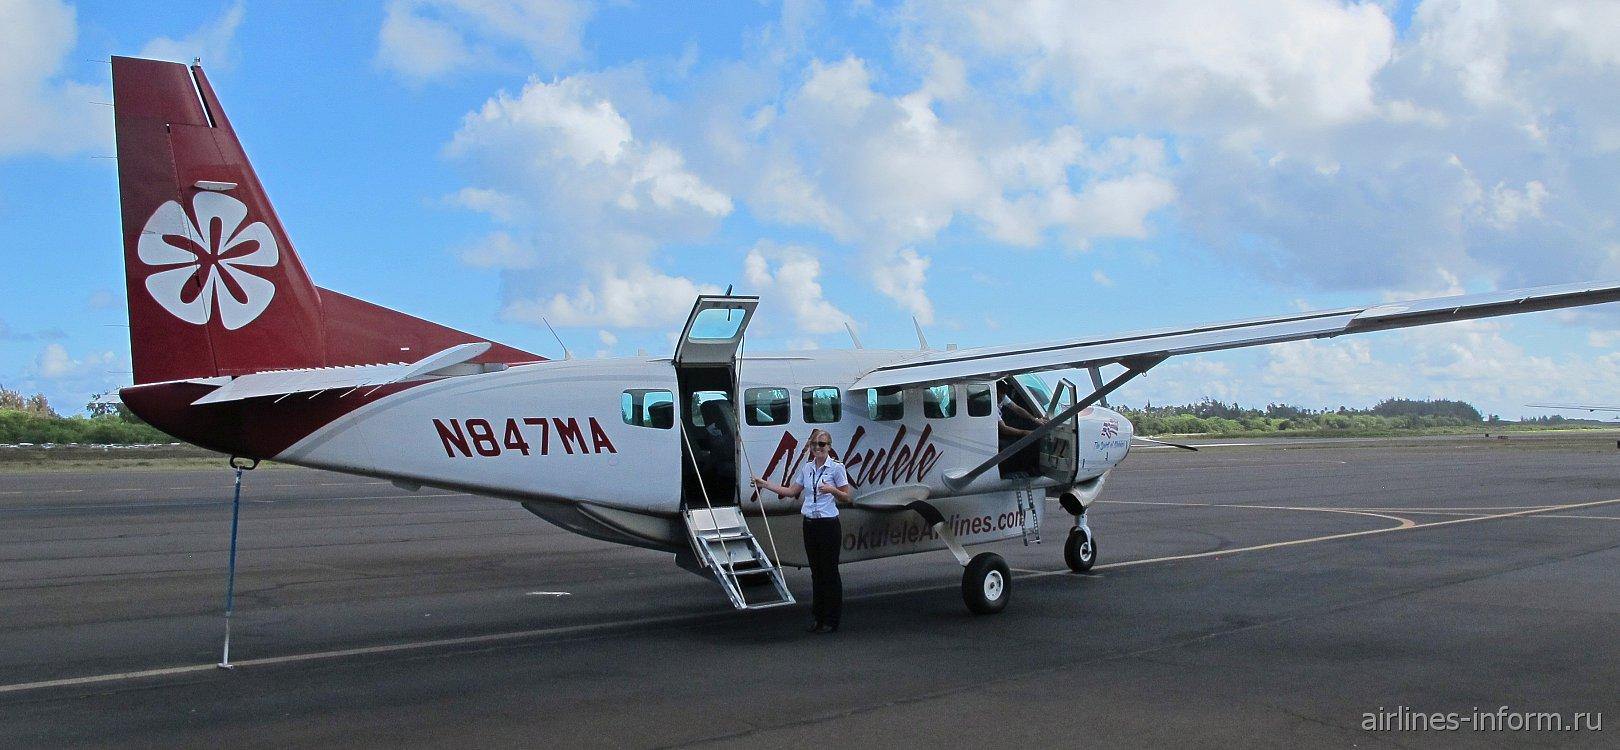 ������� Cessna Caravan ������������ Mokulele � ��������� �������